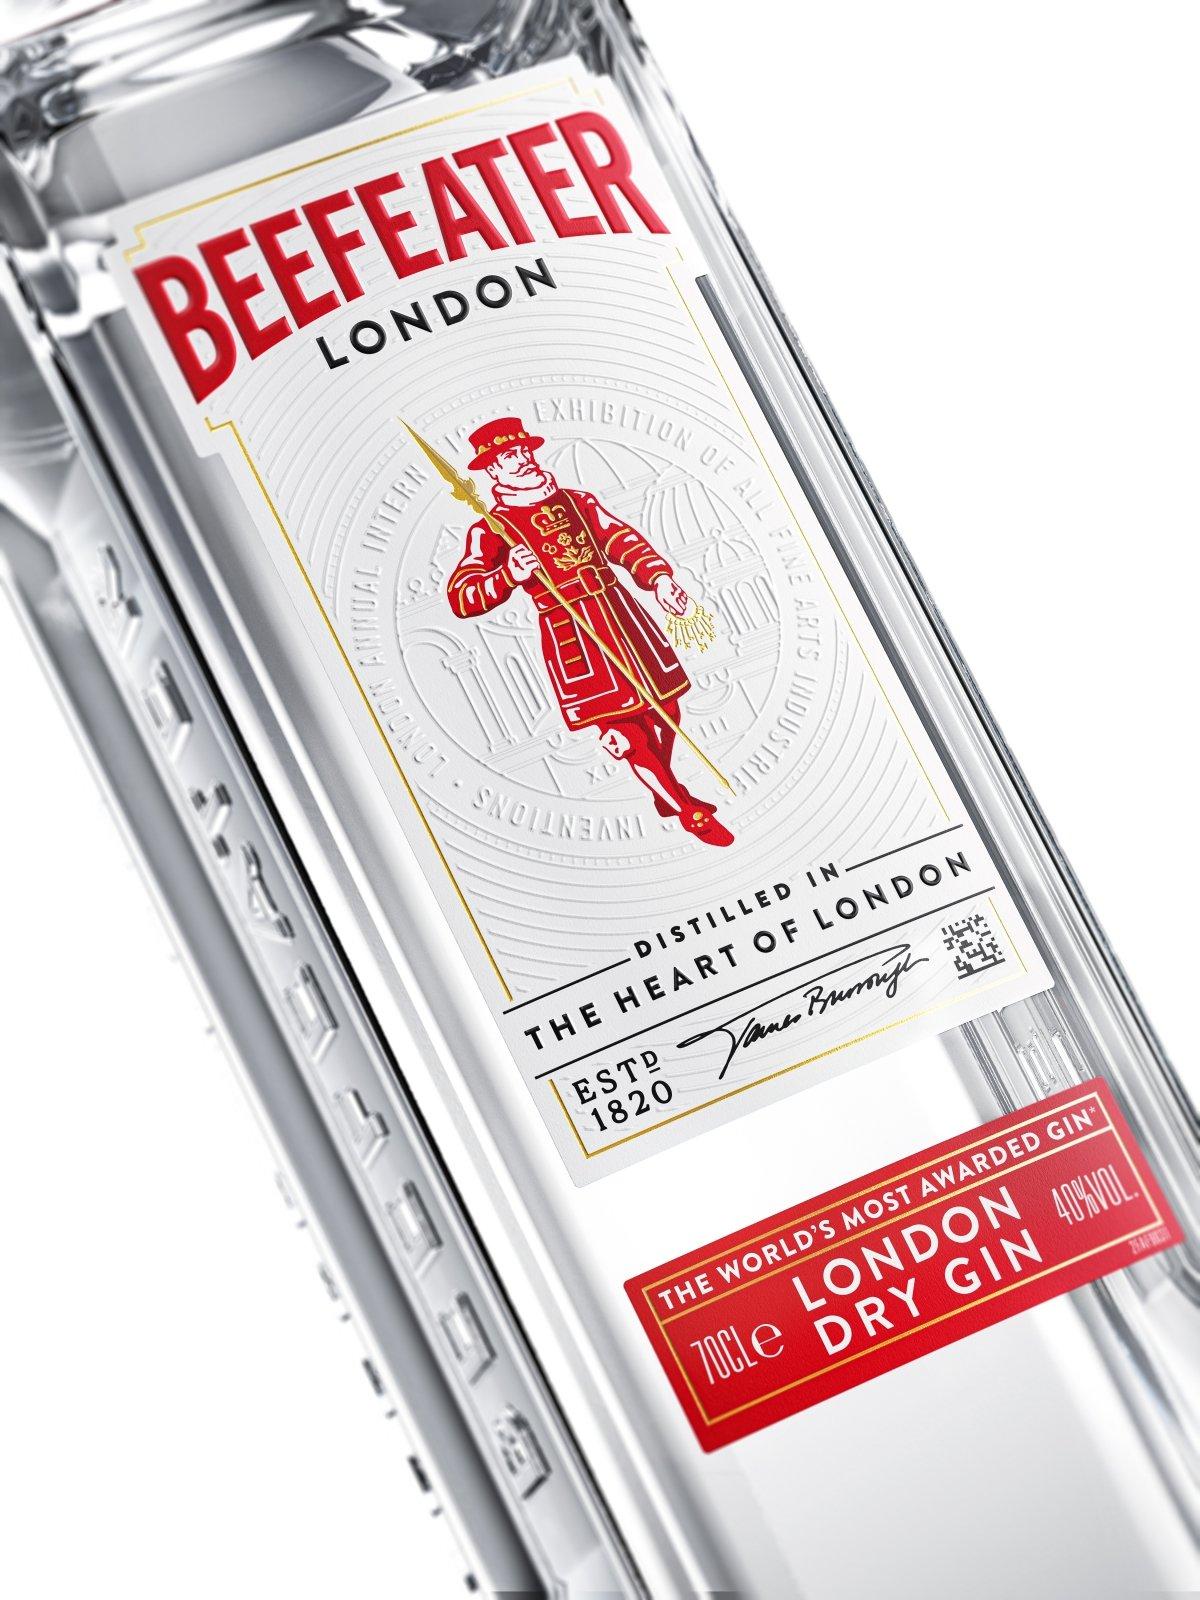 Detalle de la Beefeater London Dry